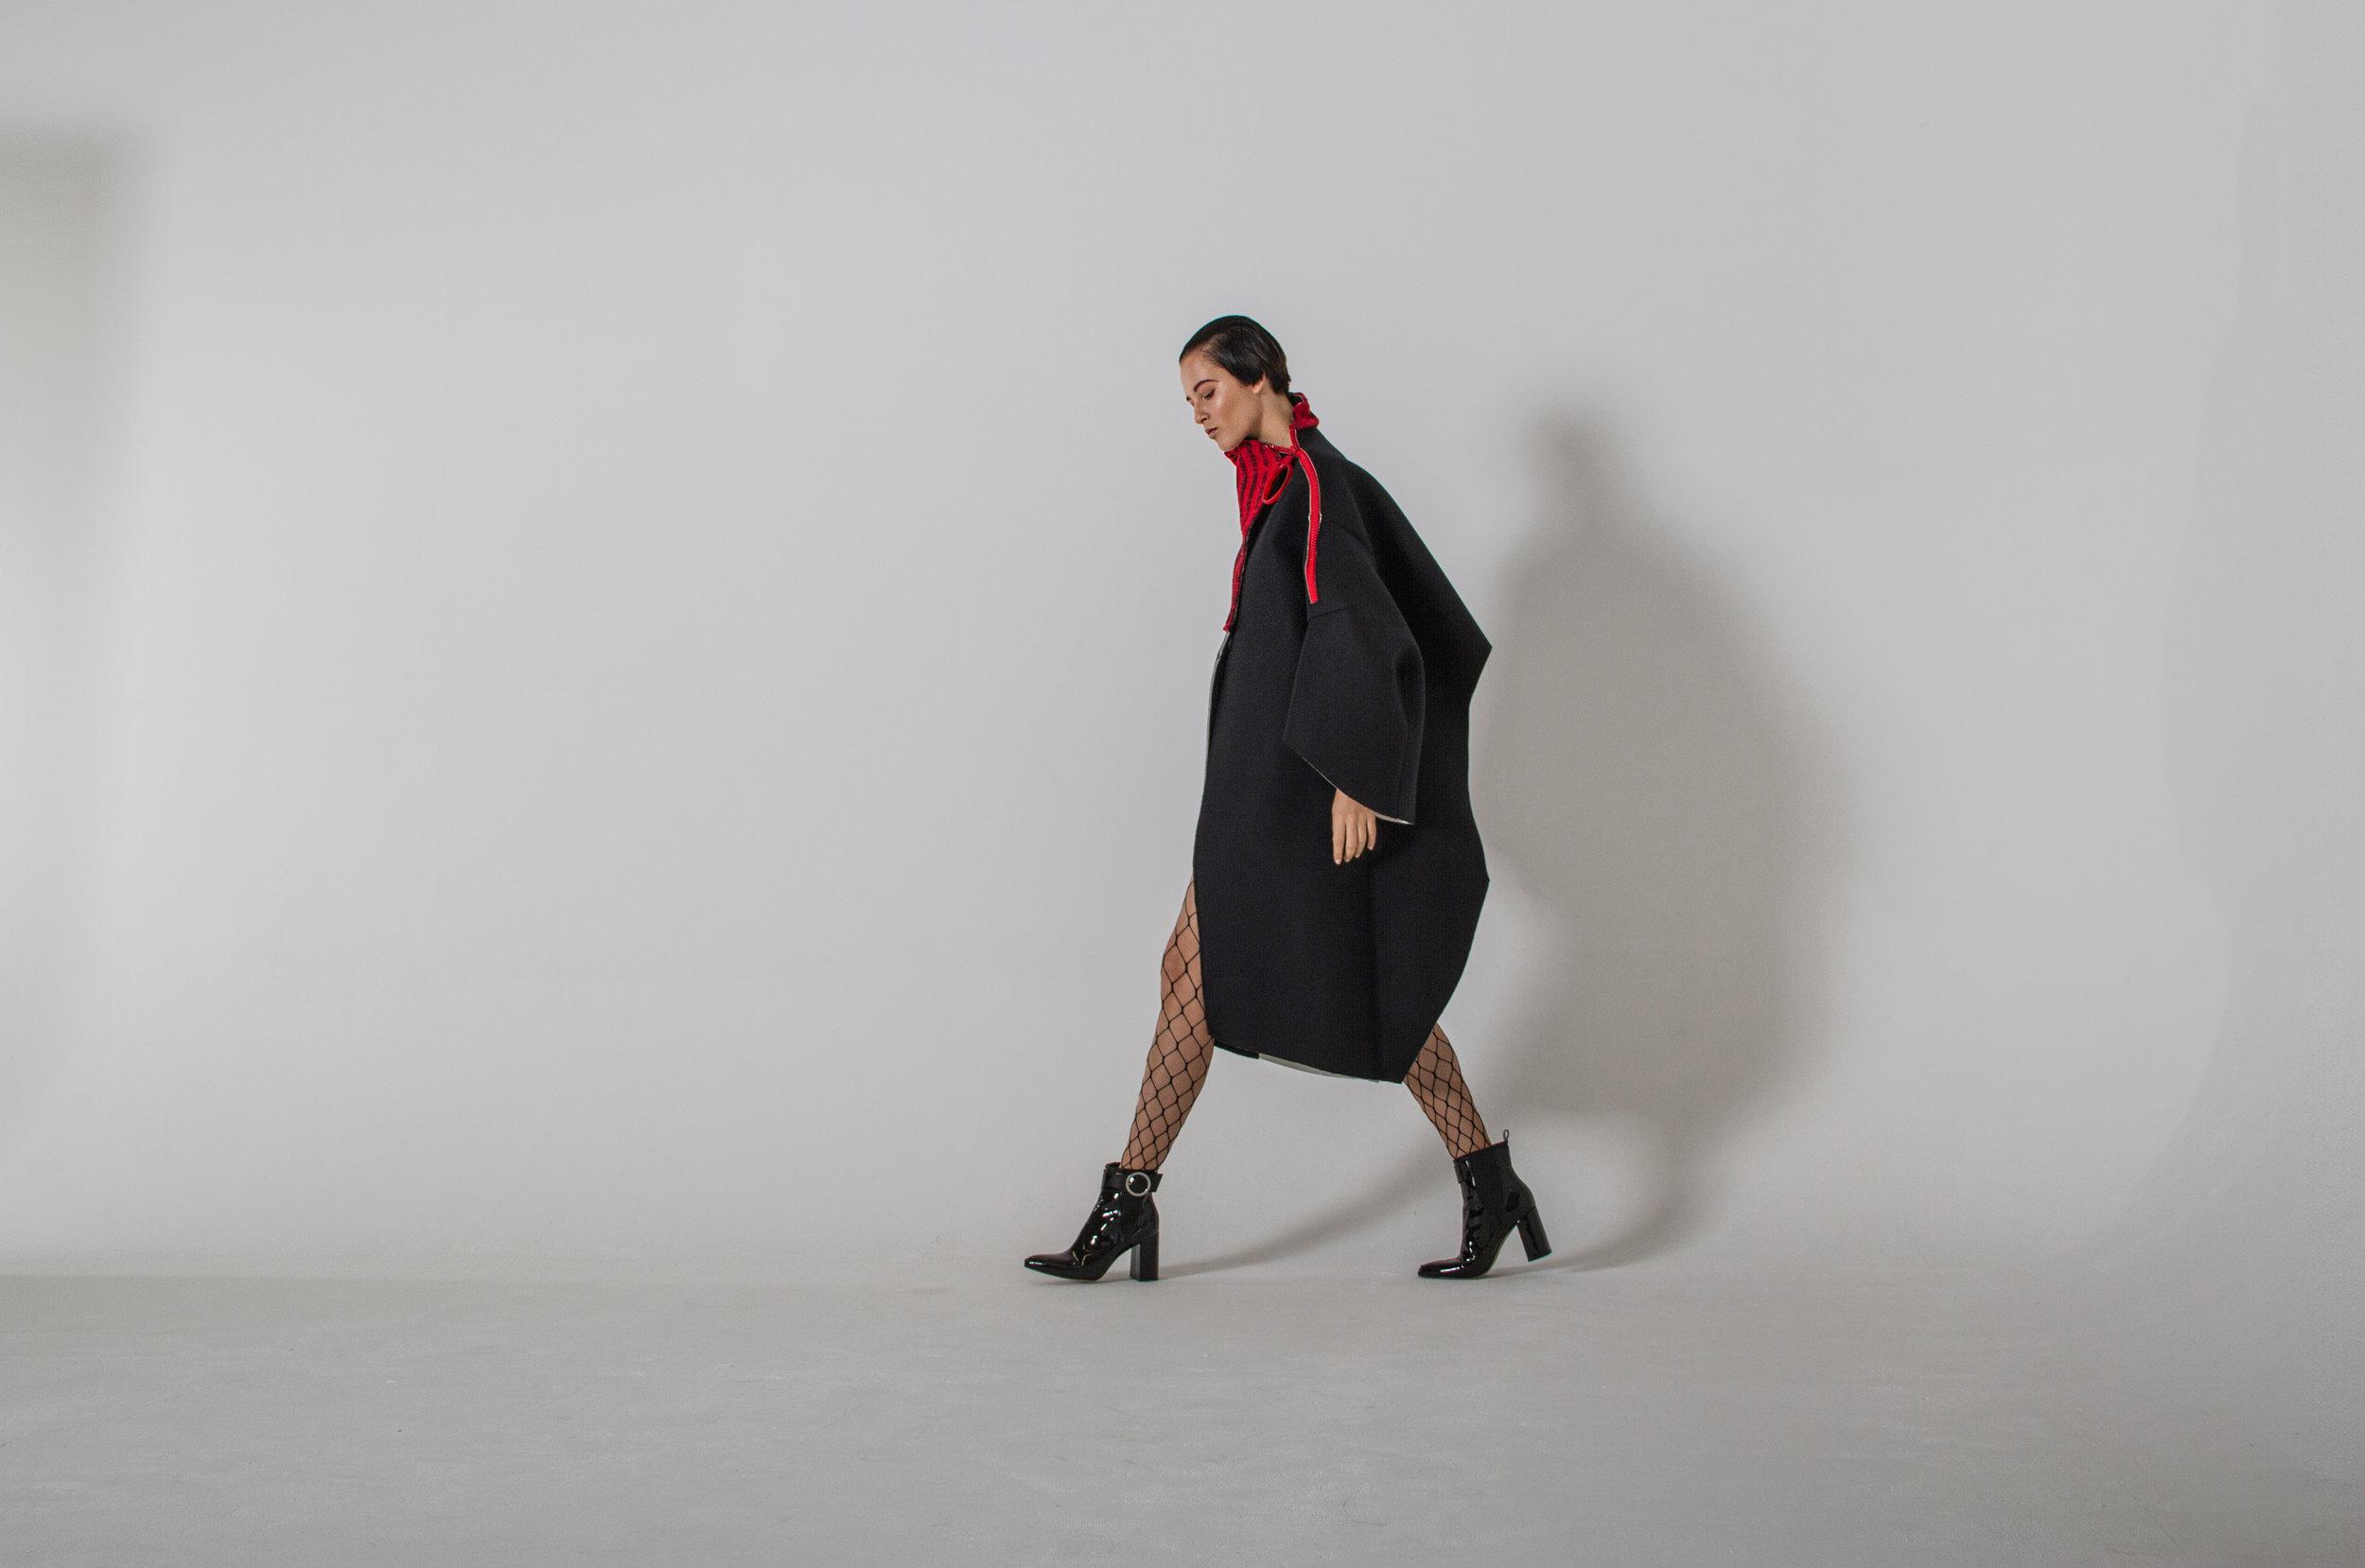 jacket MAGDALENA CZARNIECKA, shoes H&M TREND, fishnets TOPSHOP